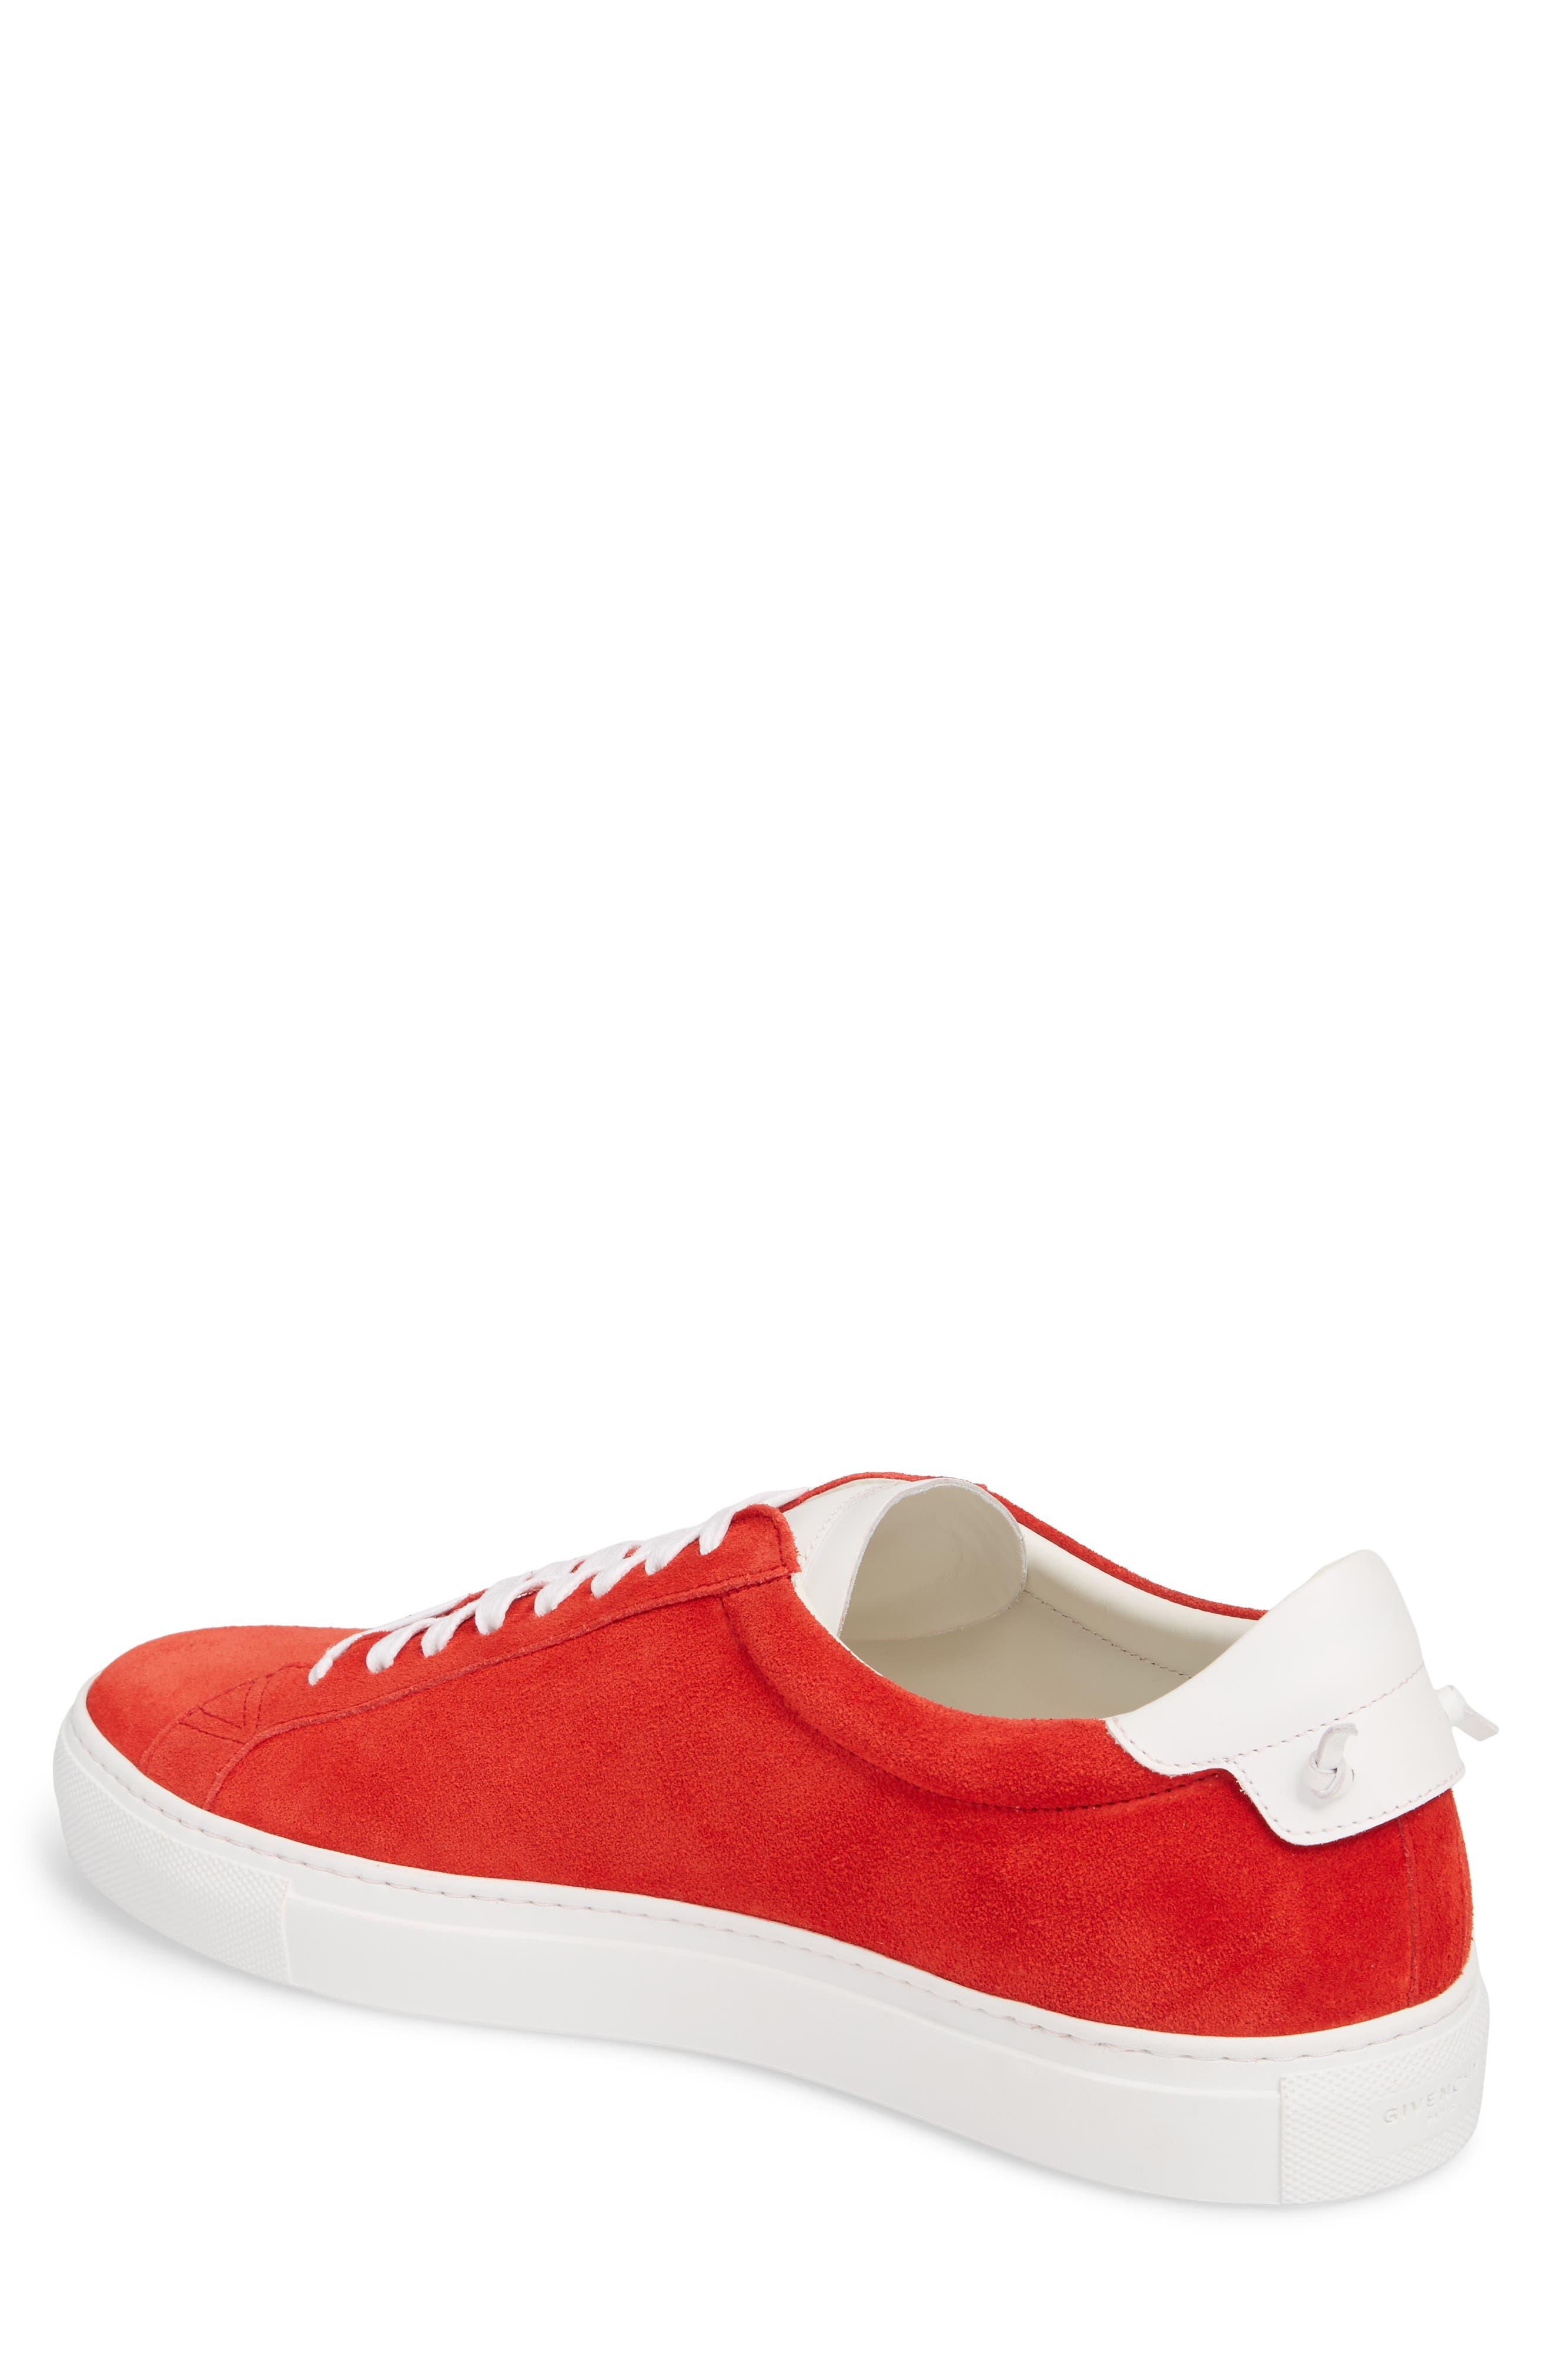 Alternate Image 2  - Givenchy 'Urban Knots Lo' Sneaker (Men)